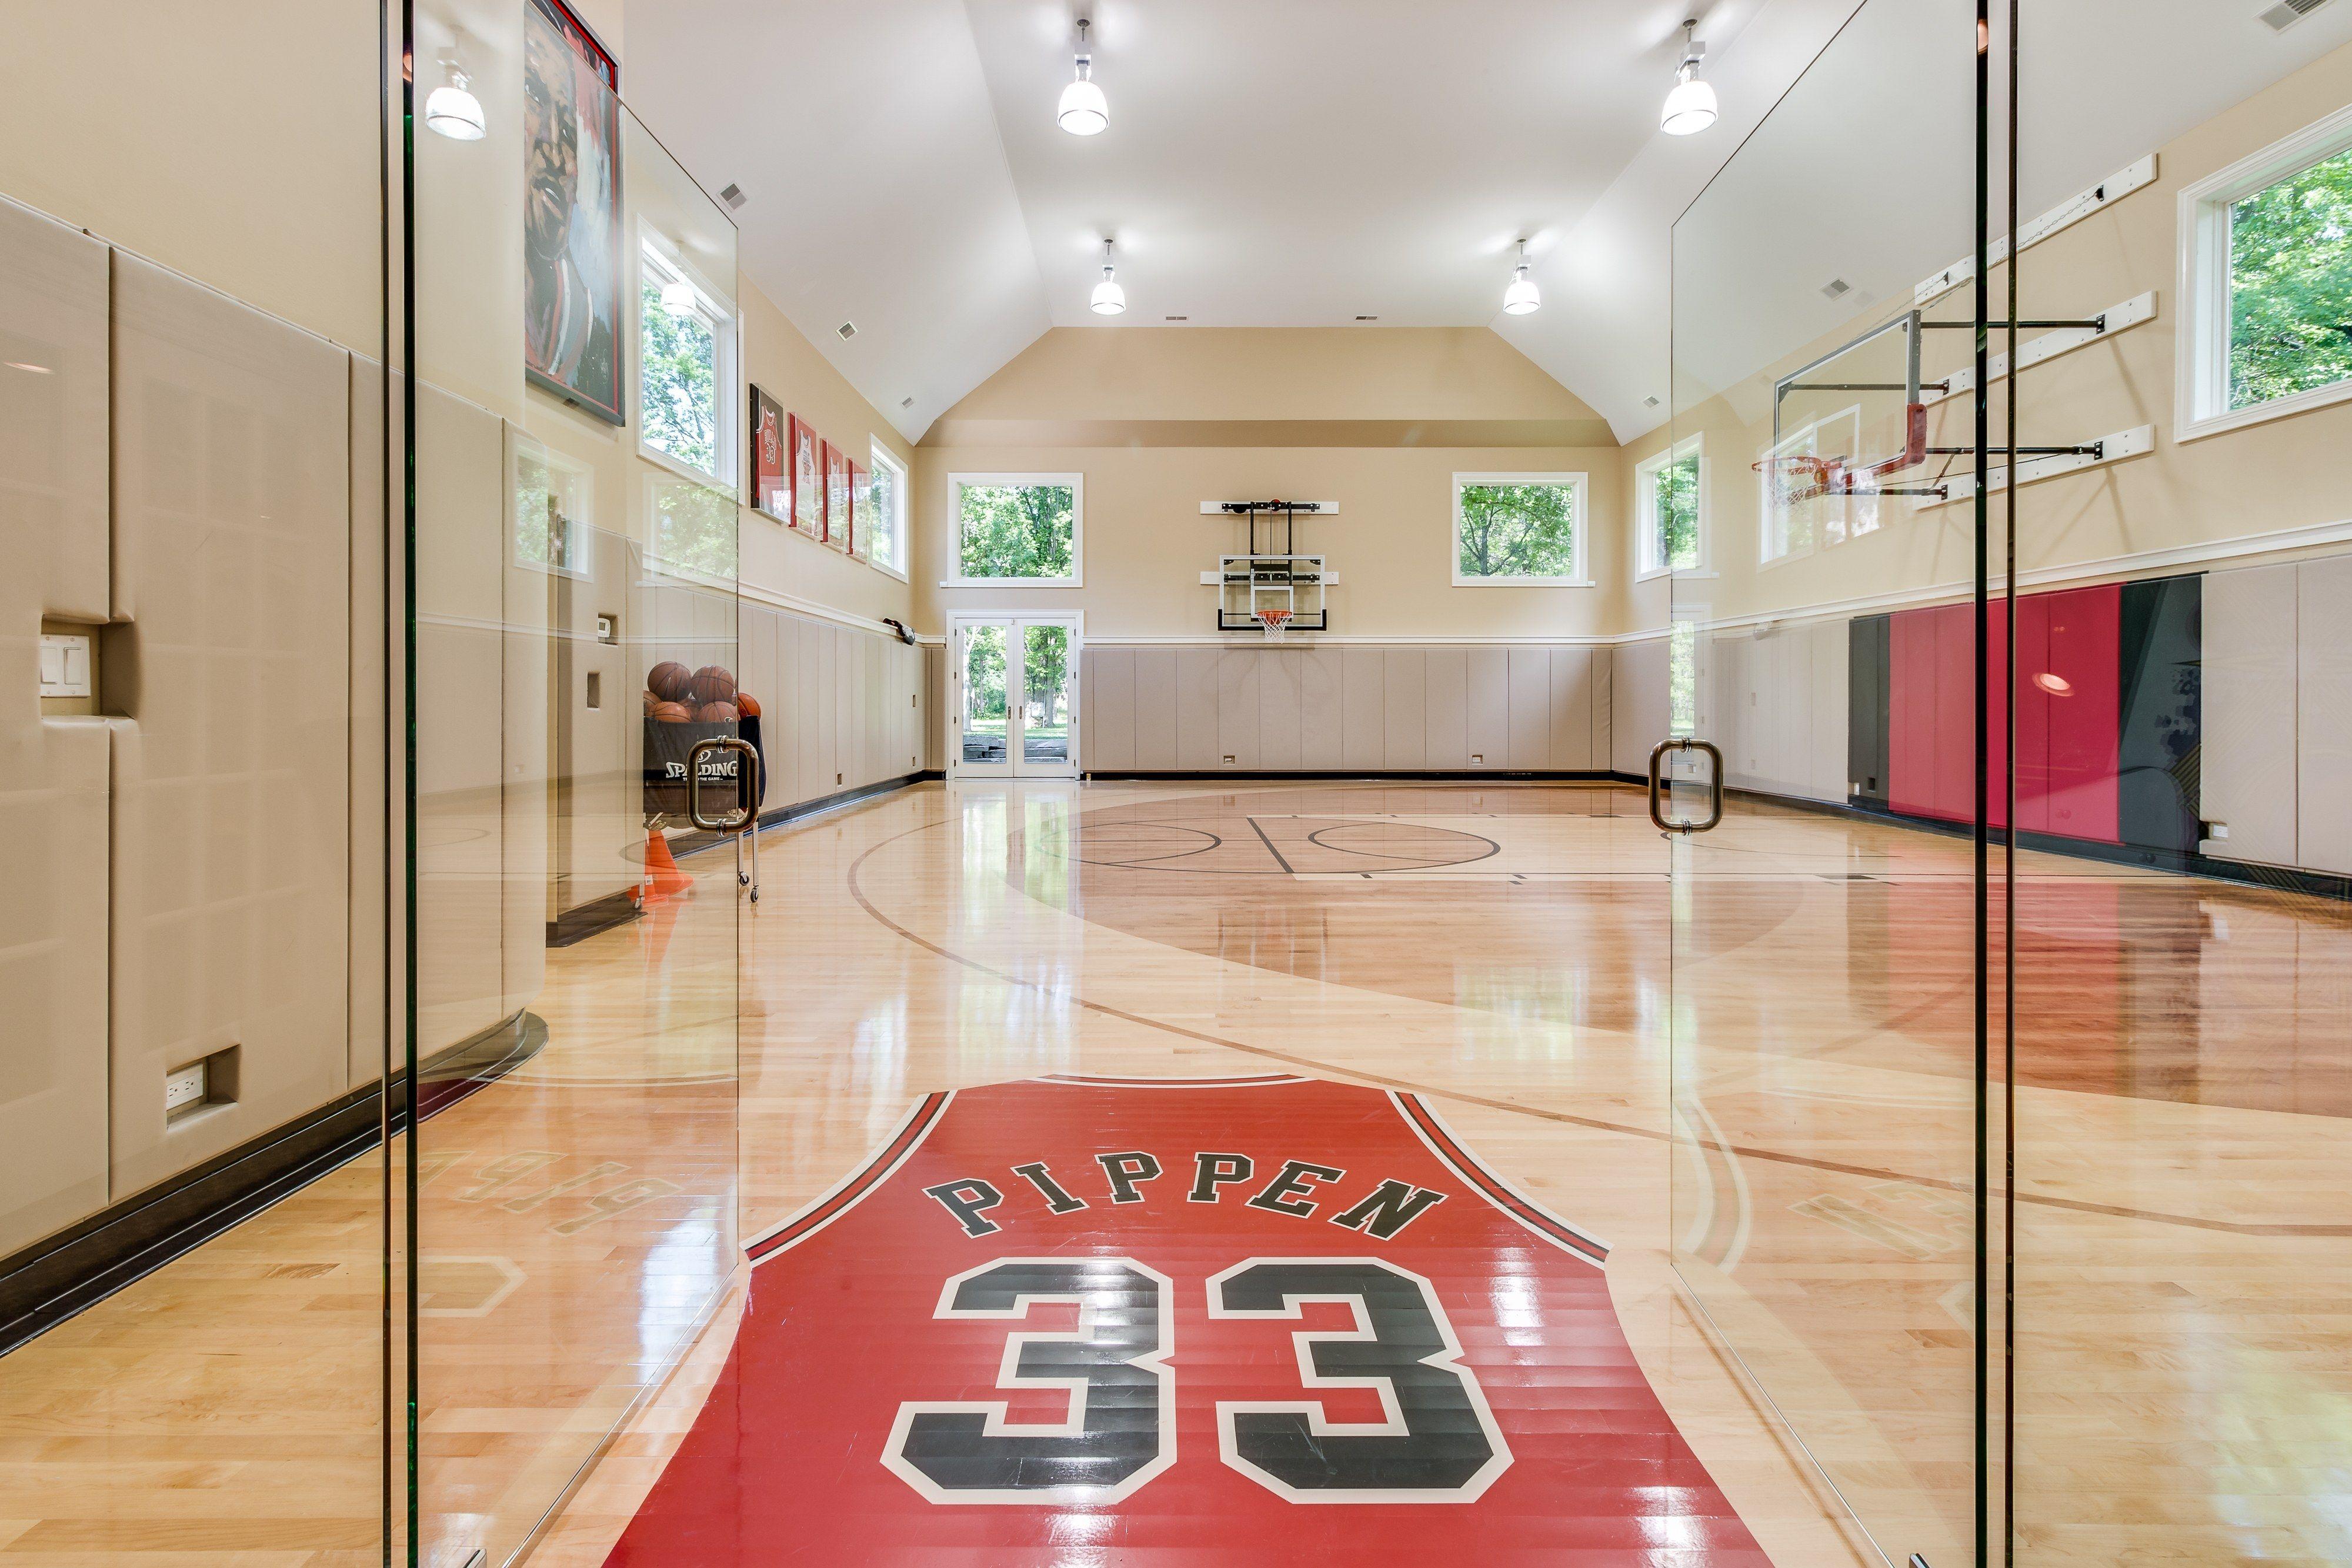 Architectural Digest On Twitter Home Basketball Court Indoor Basketball Court Scottie Pippen